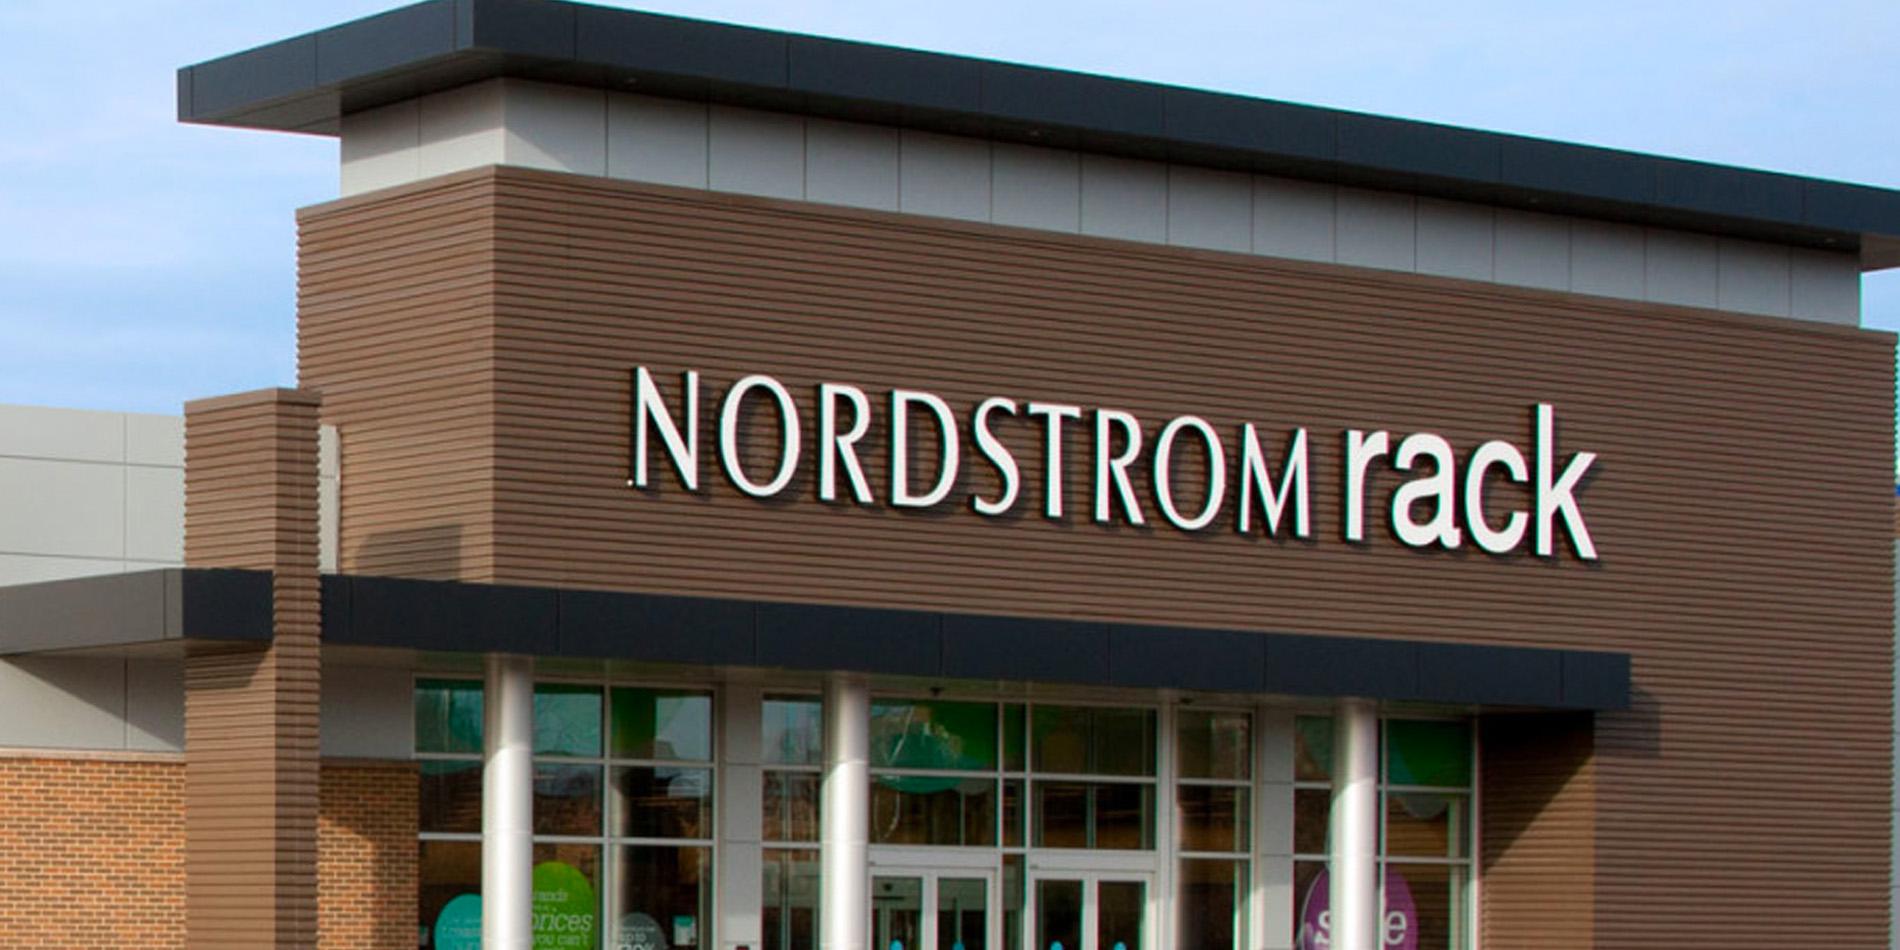 Nordstroms Pre-Black Friday Sale Includes Tons of Comfy, Podiatrist-Approved Boots